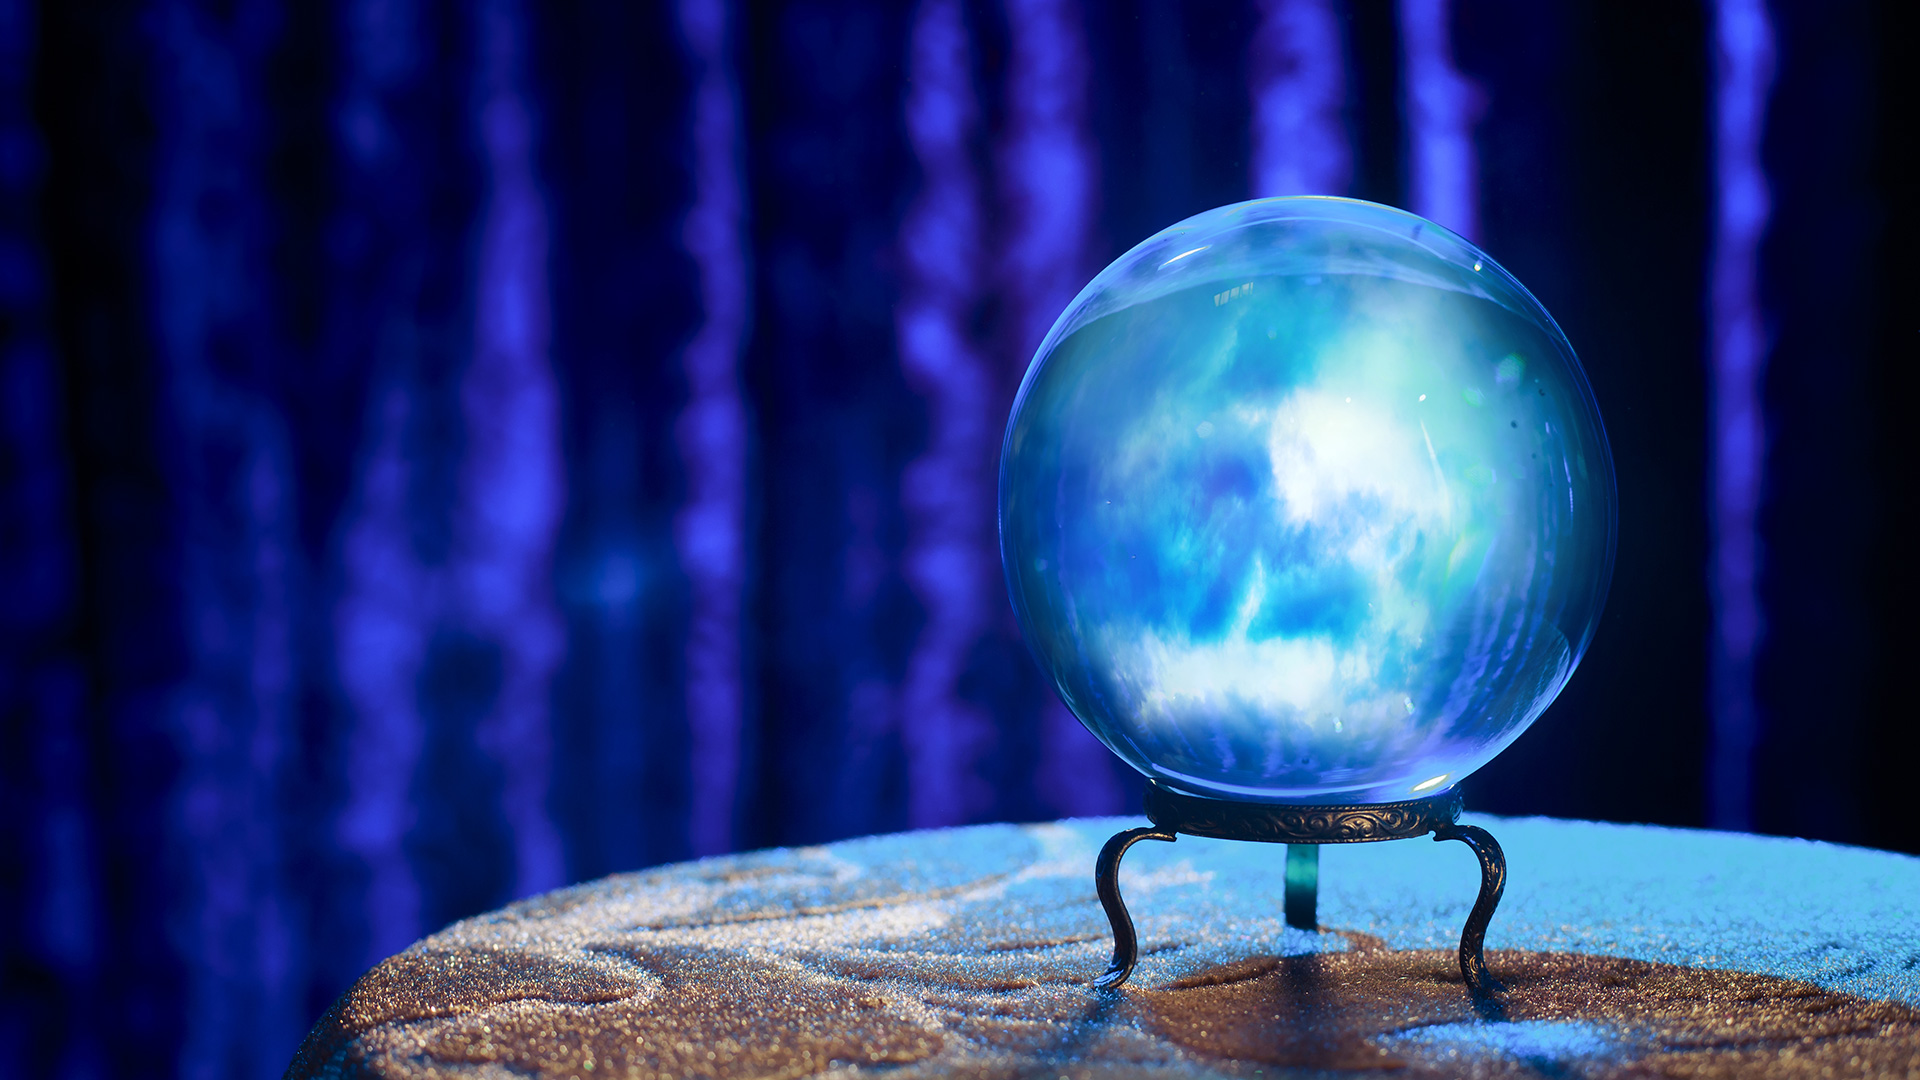 prediction-forecast-crystal-ball-future-ss-1920